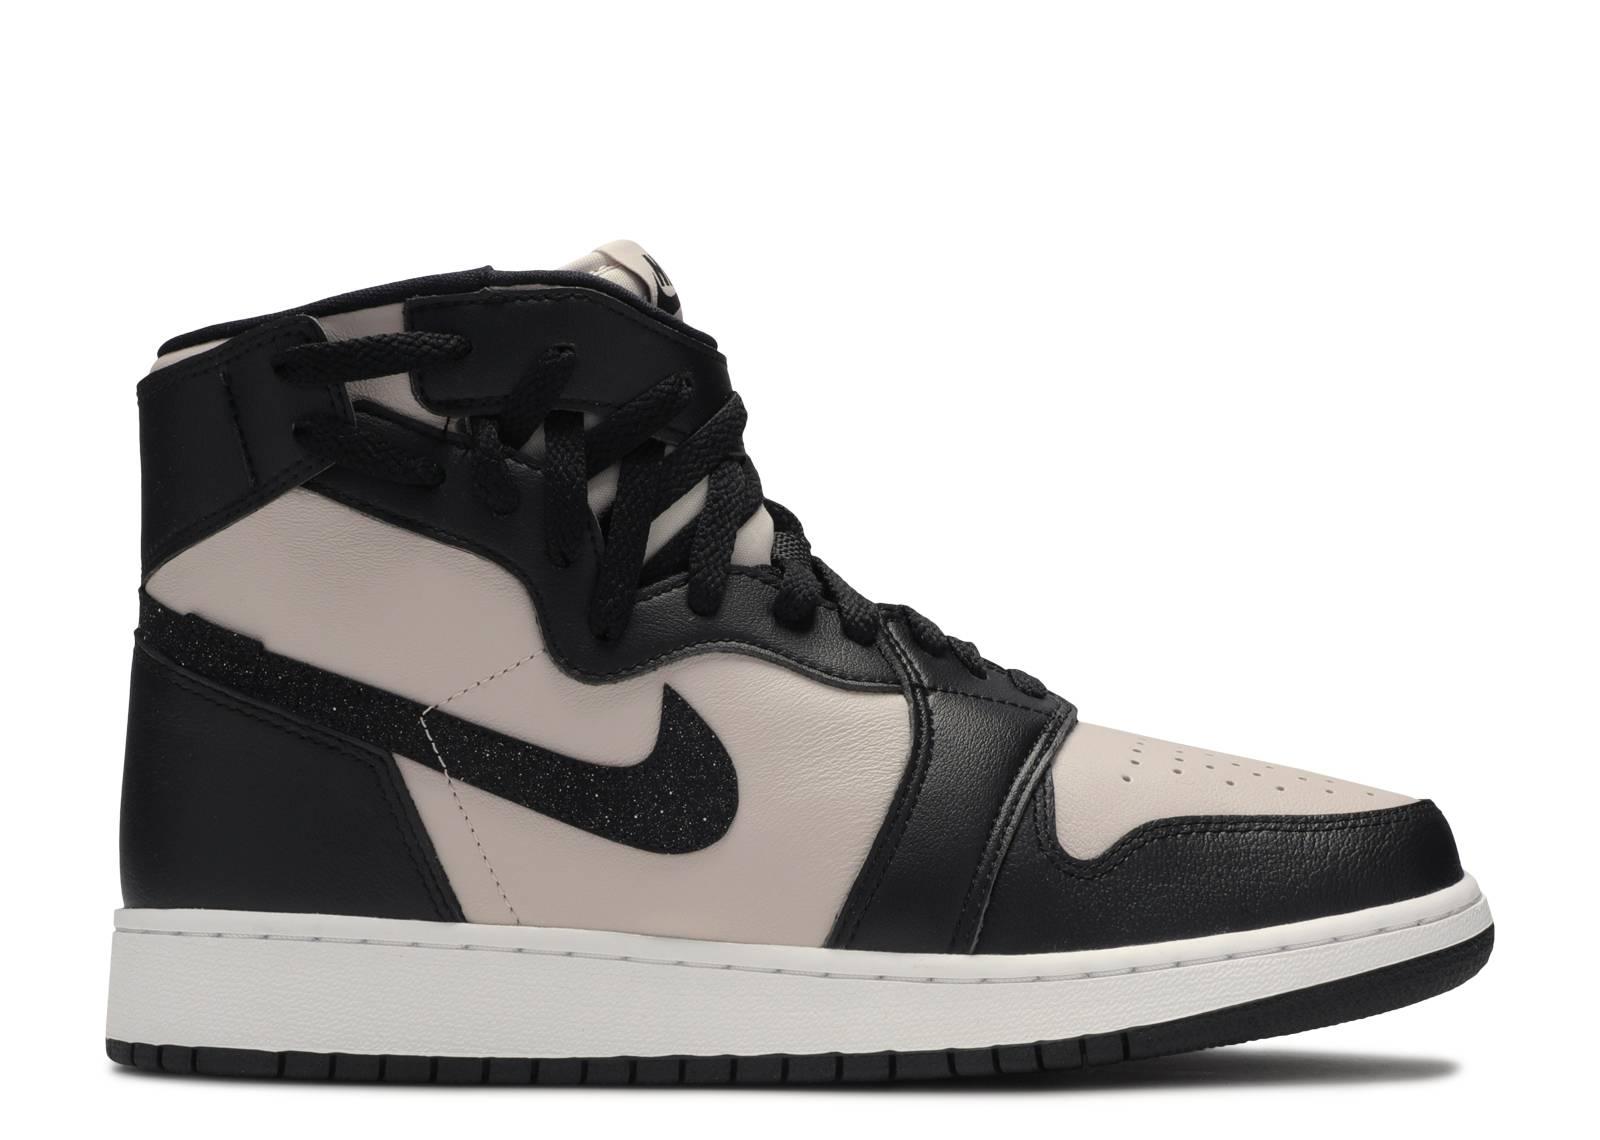 release date 99ba9 57167 Air Jordan 1 High Rebel XX